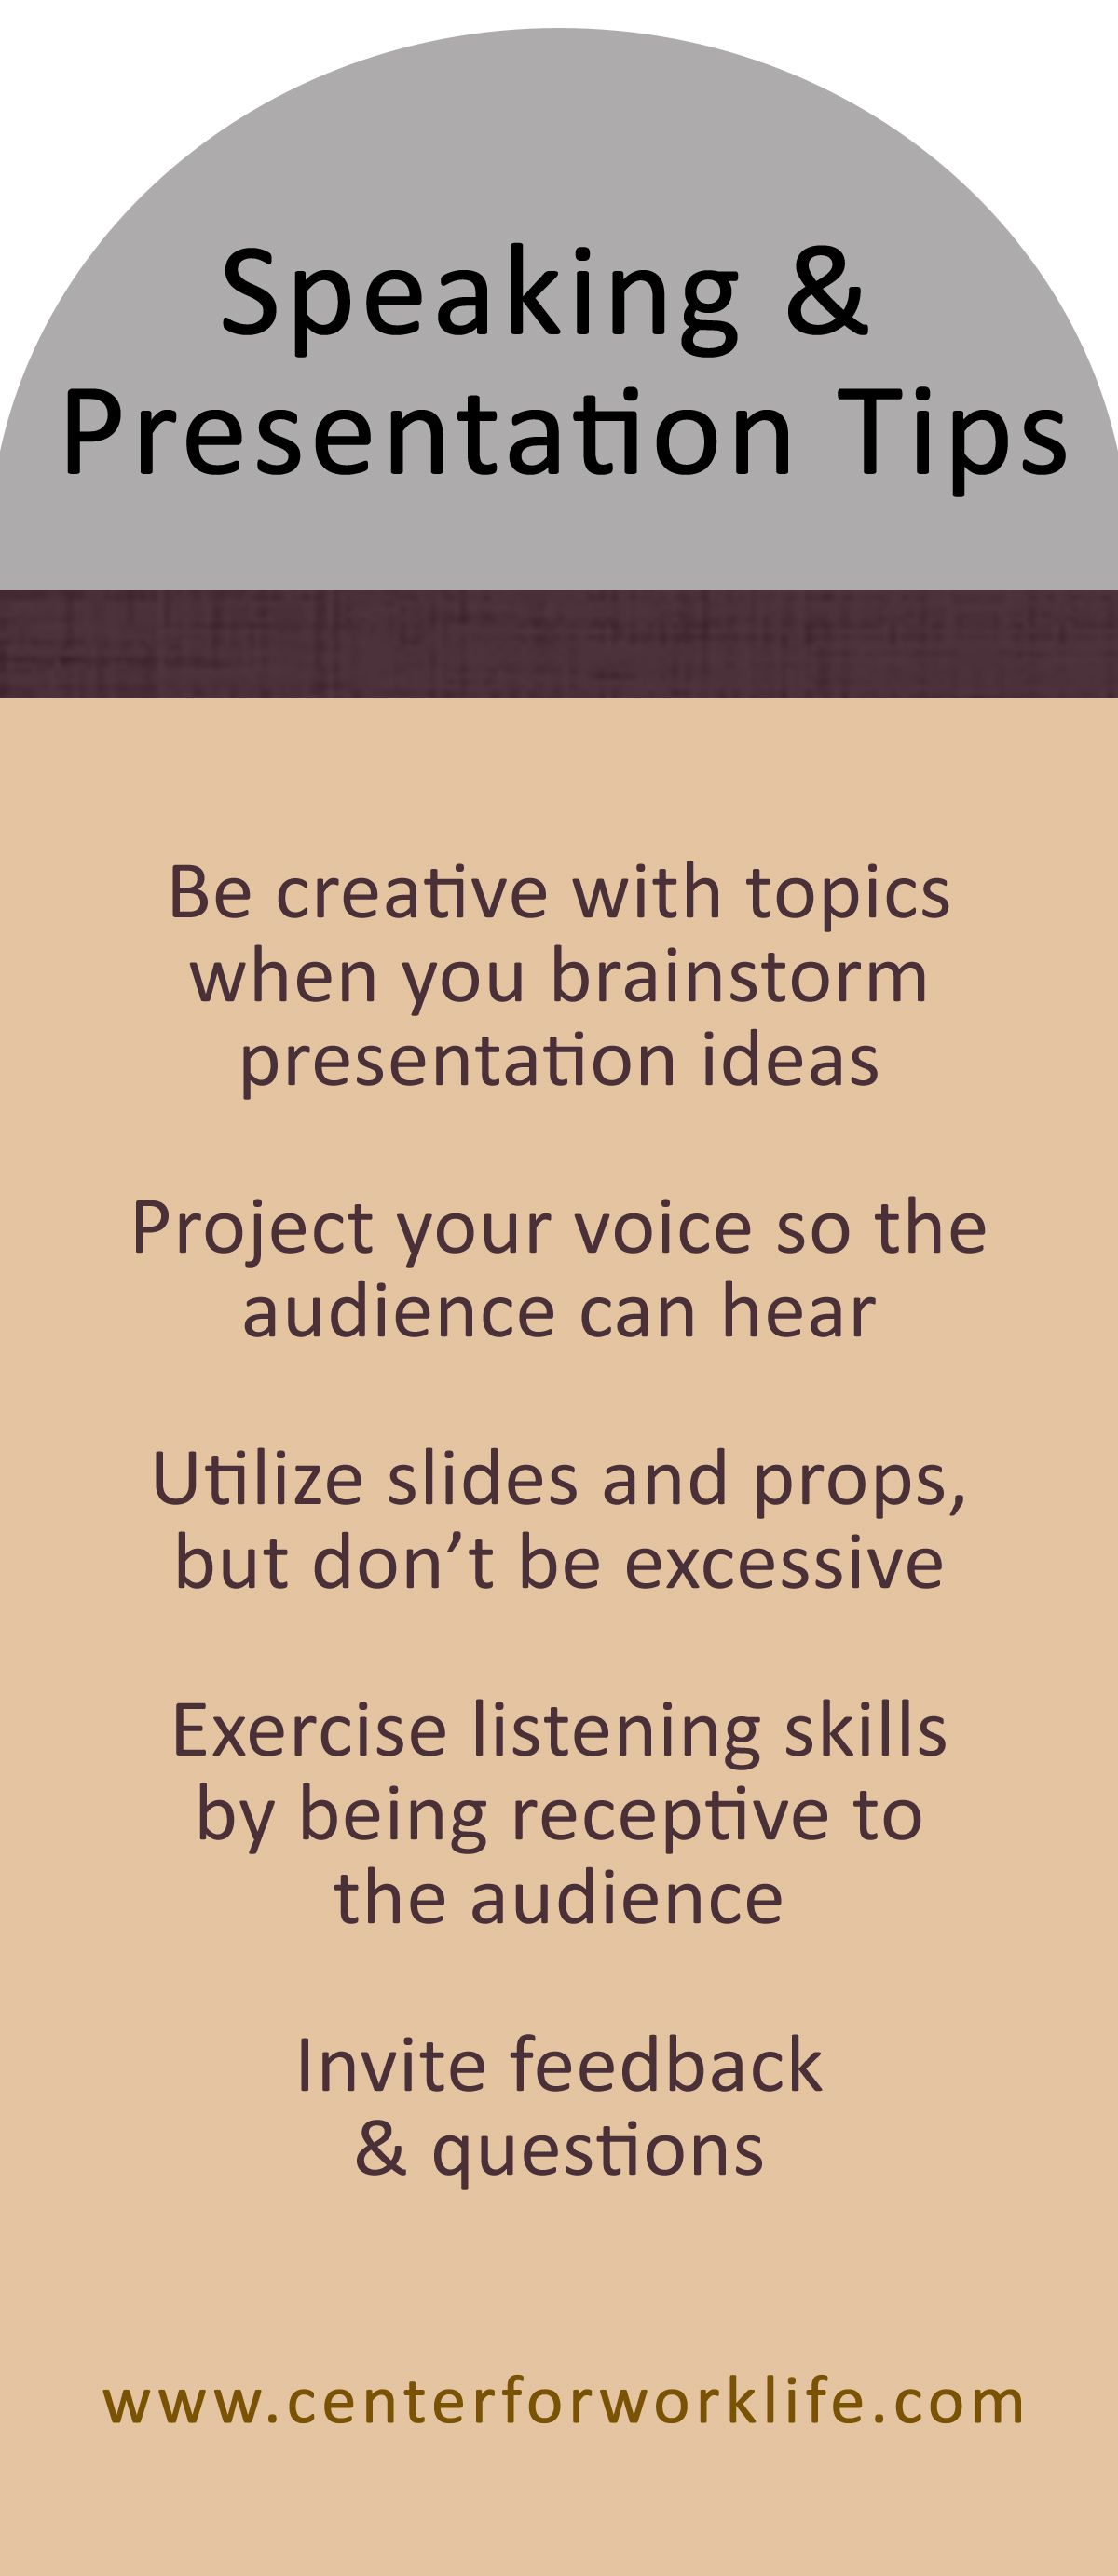 speaking and presentation tips for leaders #leadership #worktips